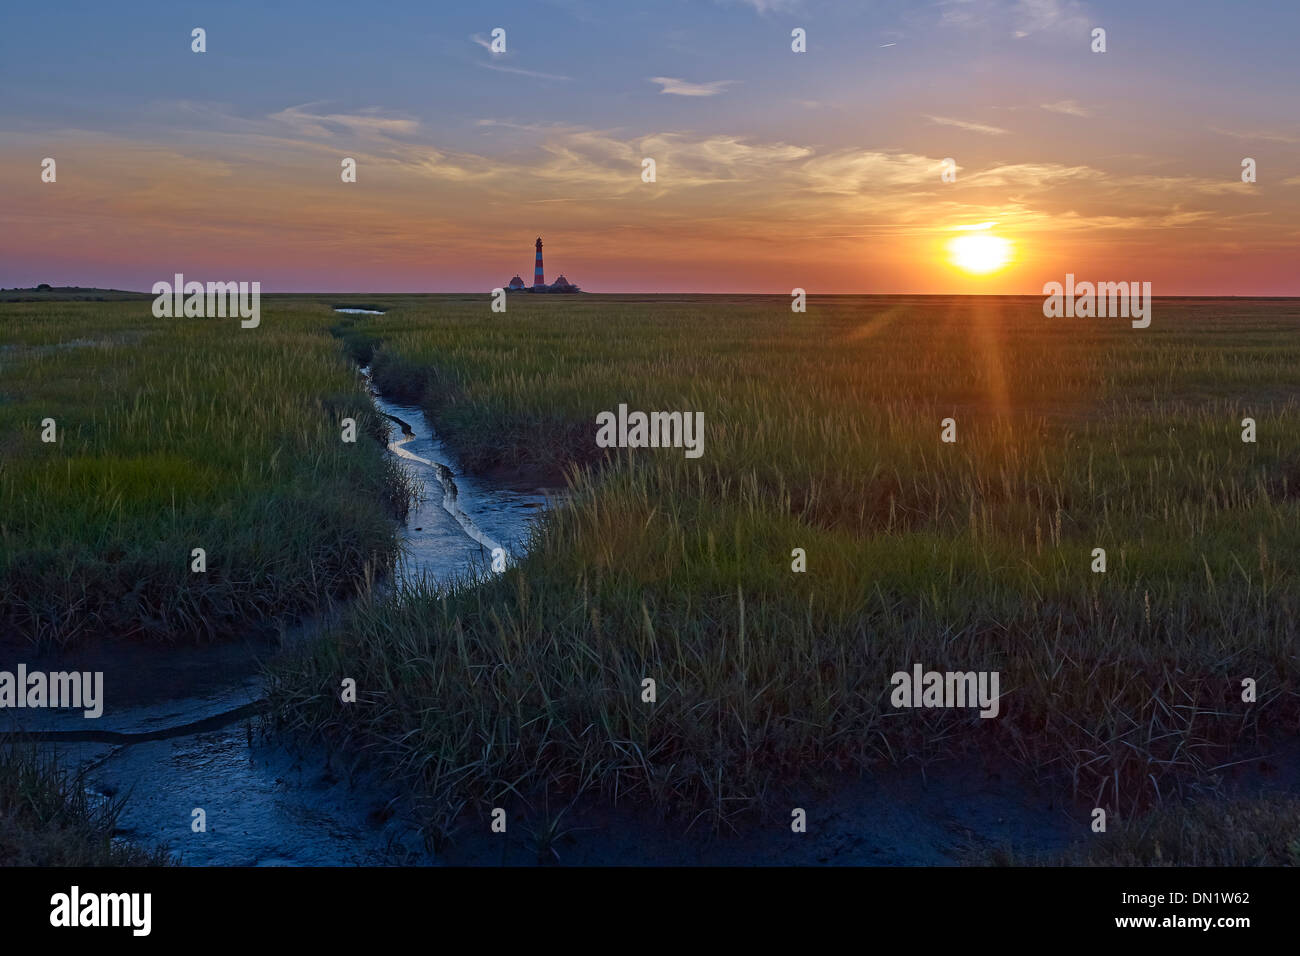 Atardecer en el faro, Eiderstedt Westerheversand península, Frisia septentrional, Schleswig-Holstein, Alemania Imagen De Stock